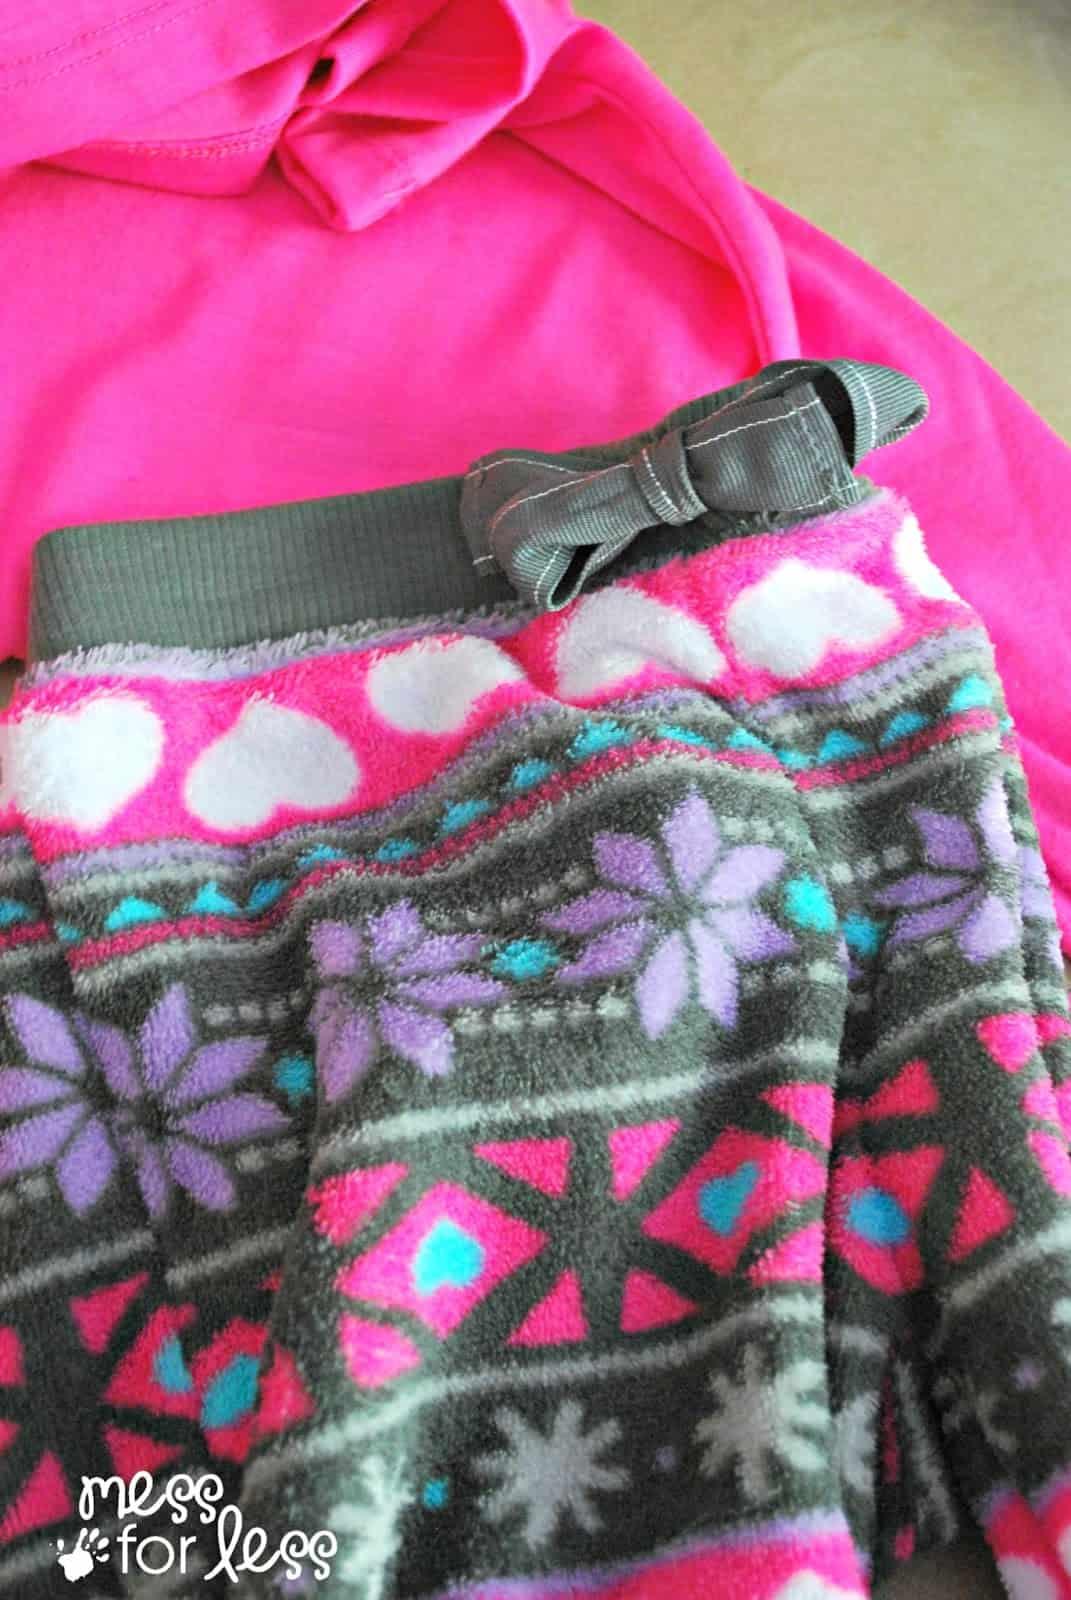 pajama from sears #shop #ThisisStyle #Cbias